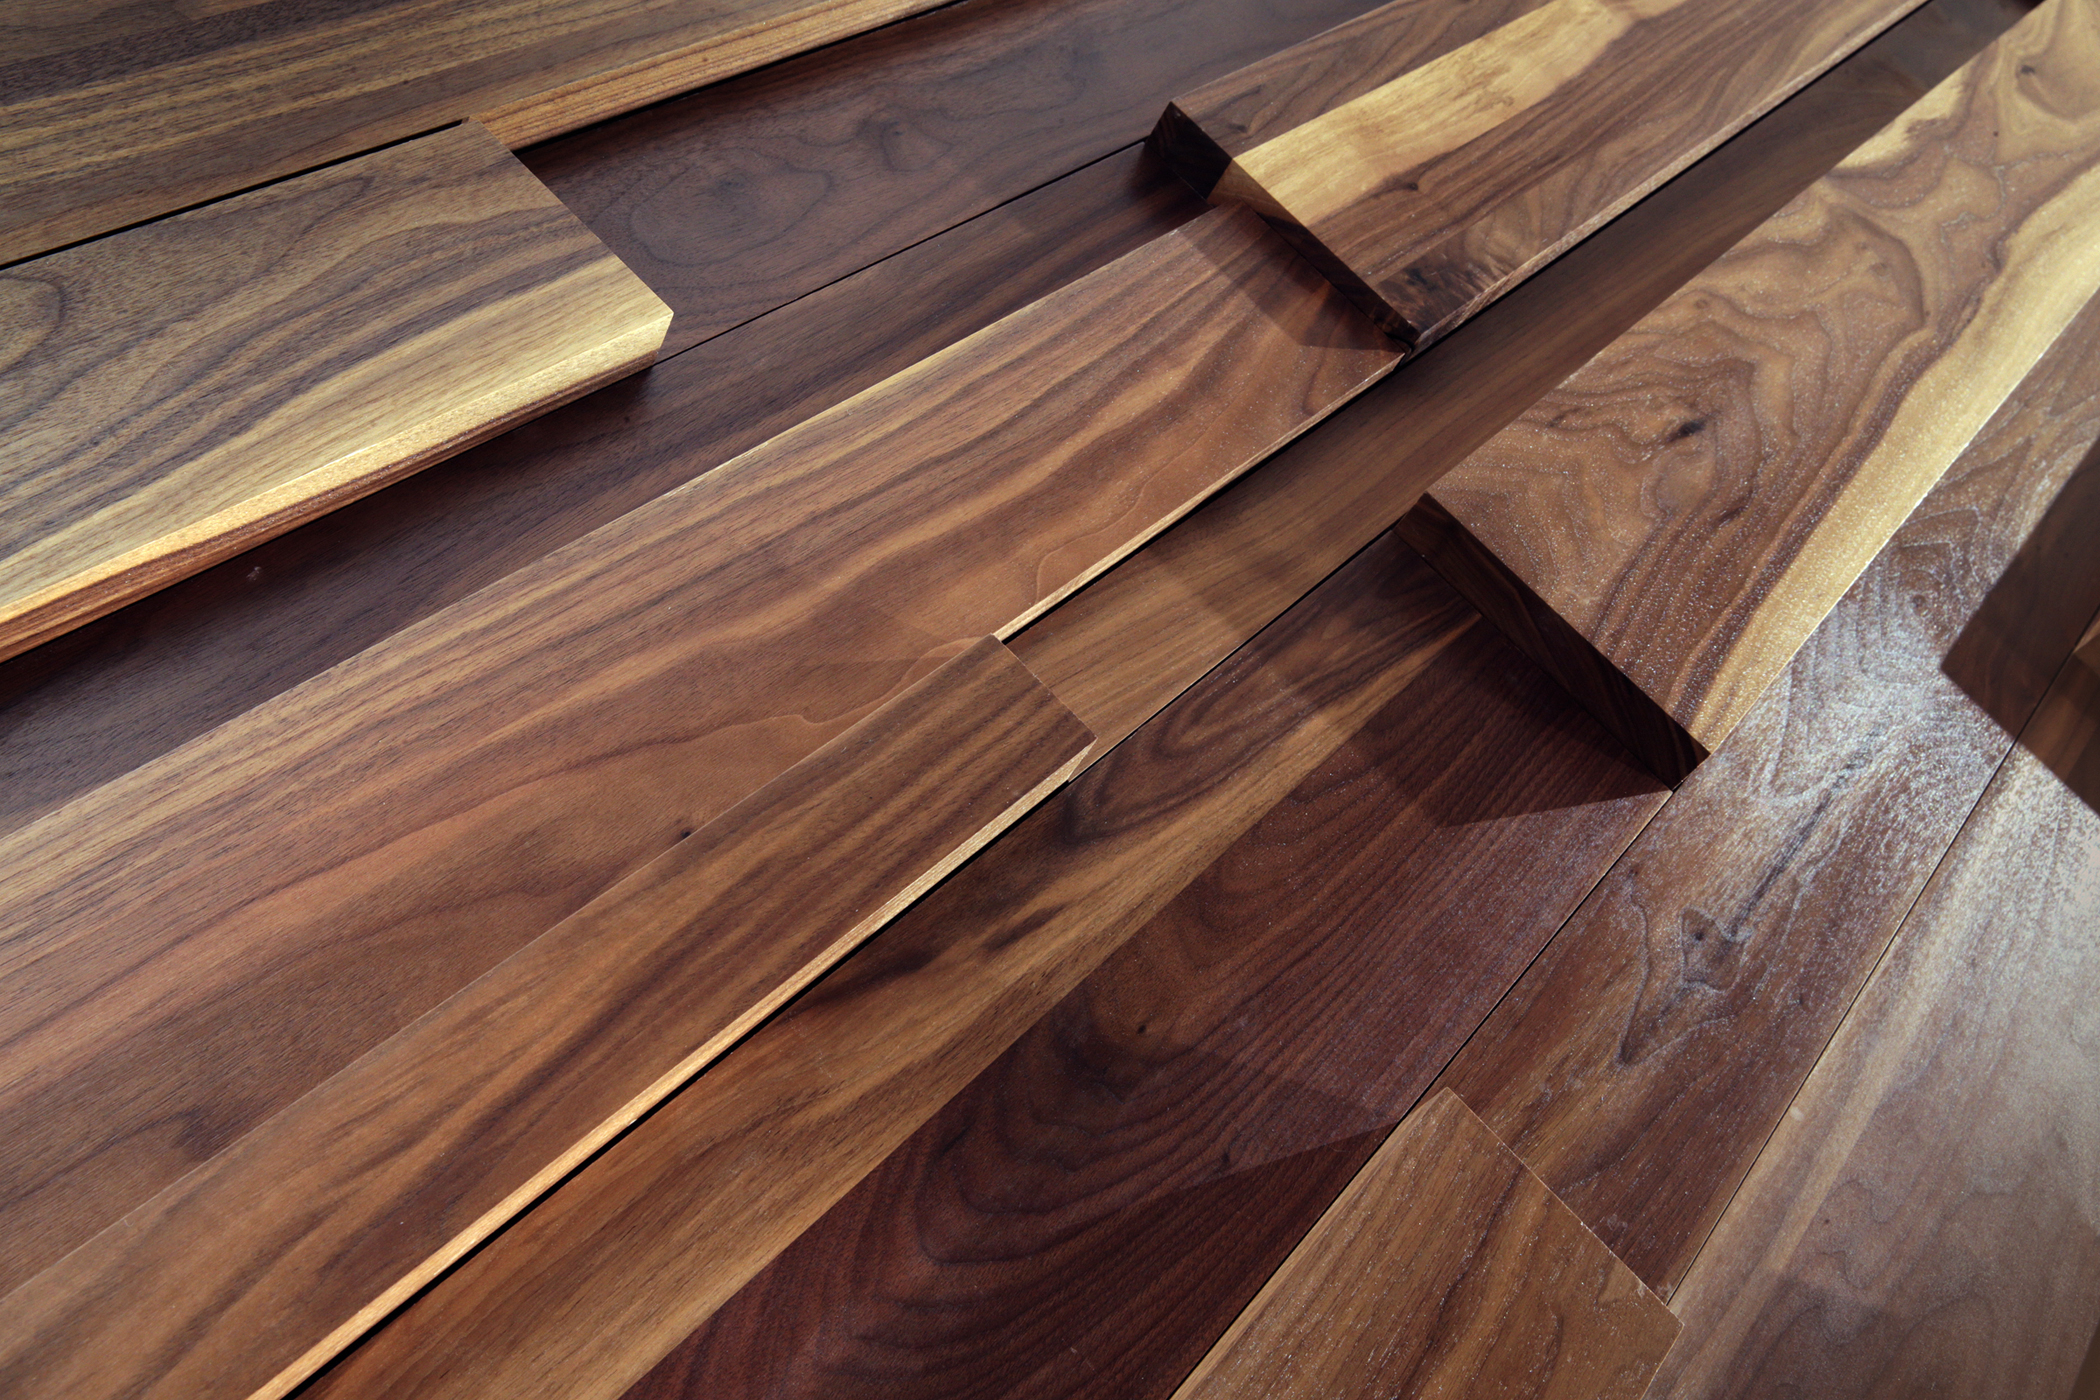 3D Wood Wall Panels Ottawa Classic Stairs